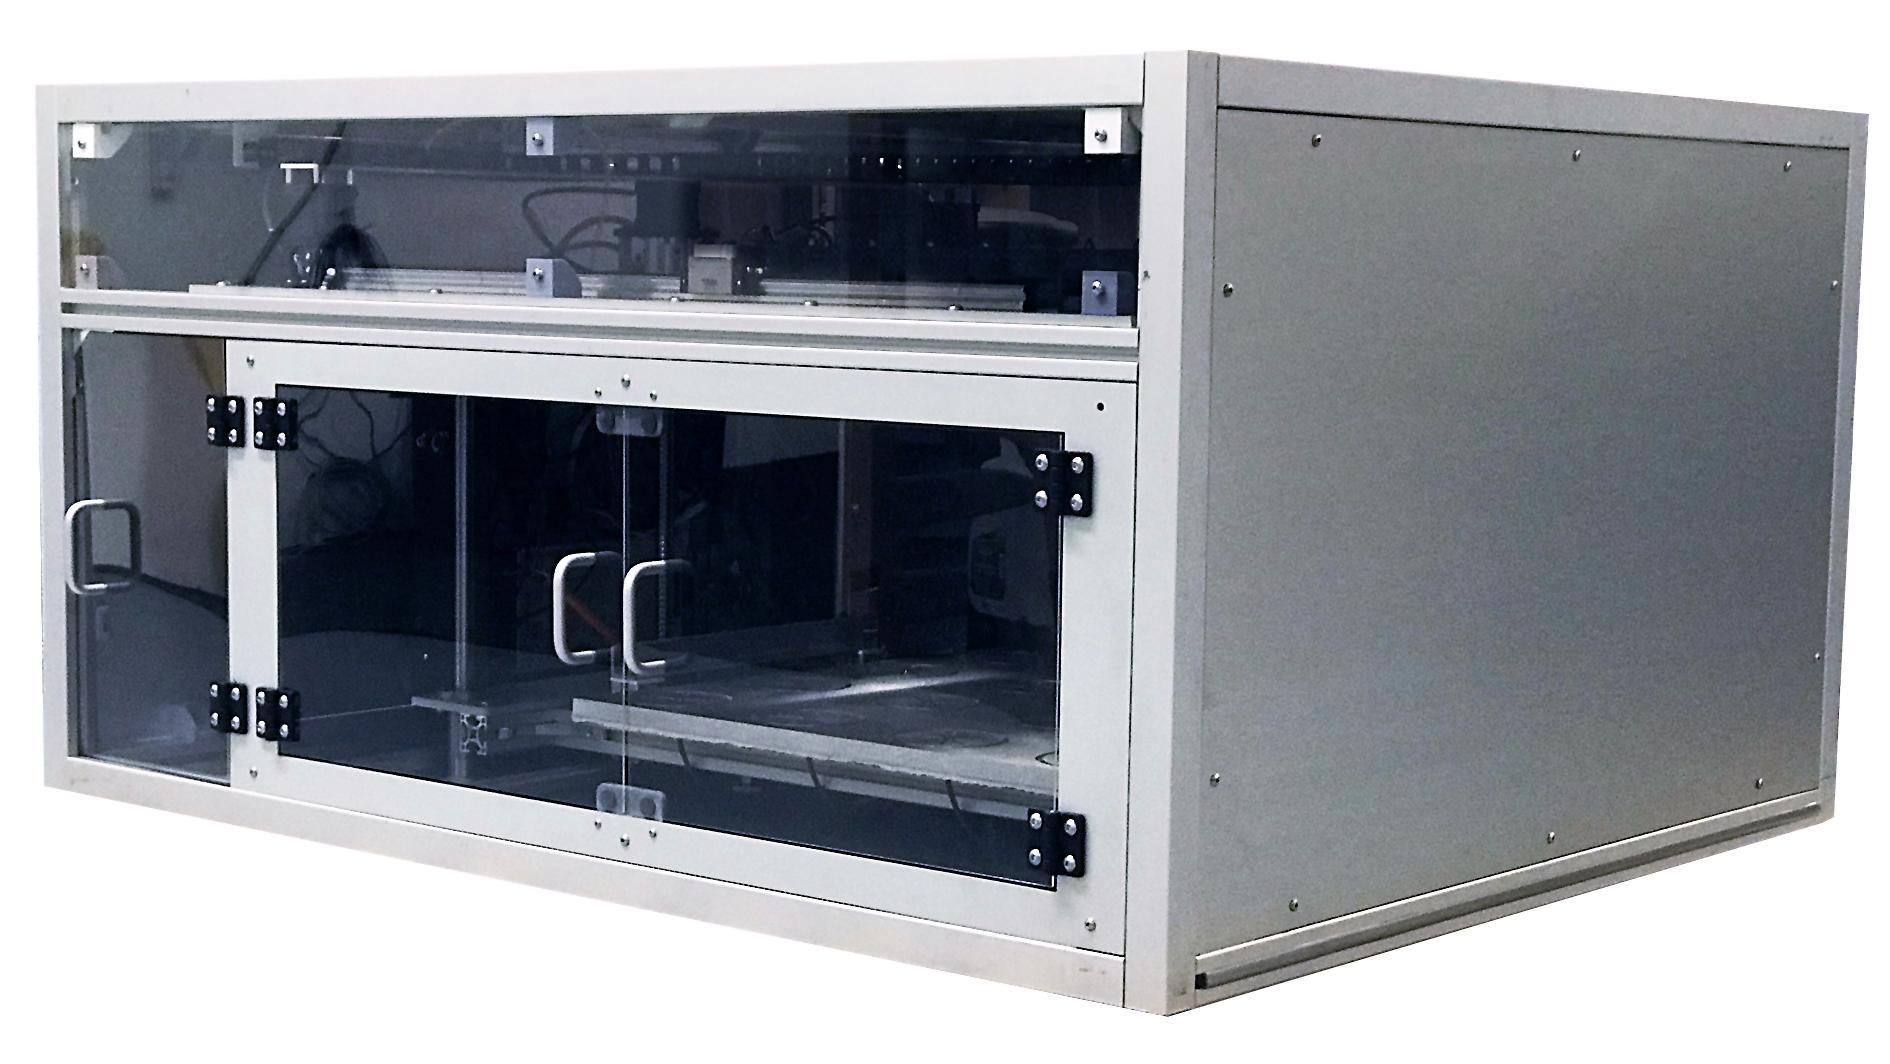 isolated geofabrica 3d printer